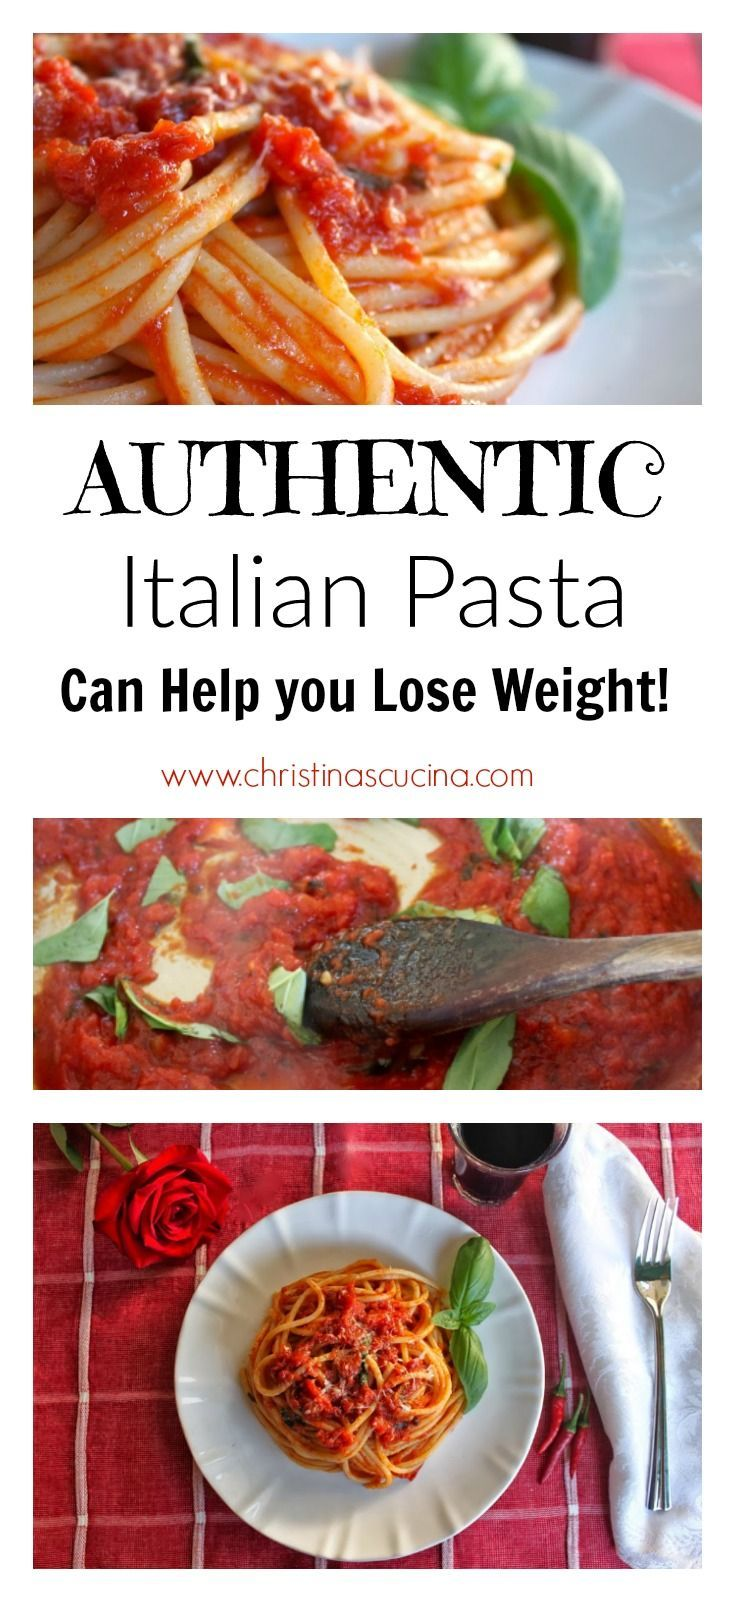 Authentic Quick Italian Tomato Sauce For Pasta Italian Recipes Authentic Italian Recipes Italian Tomato Sauce